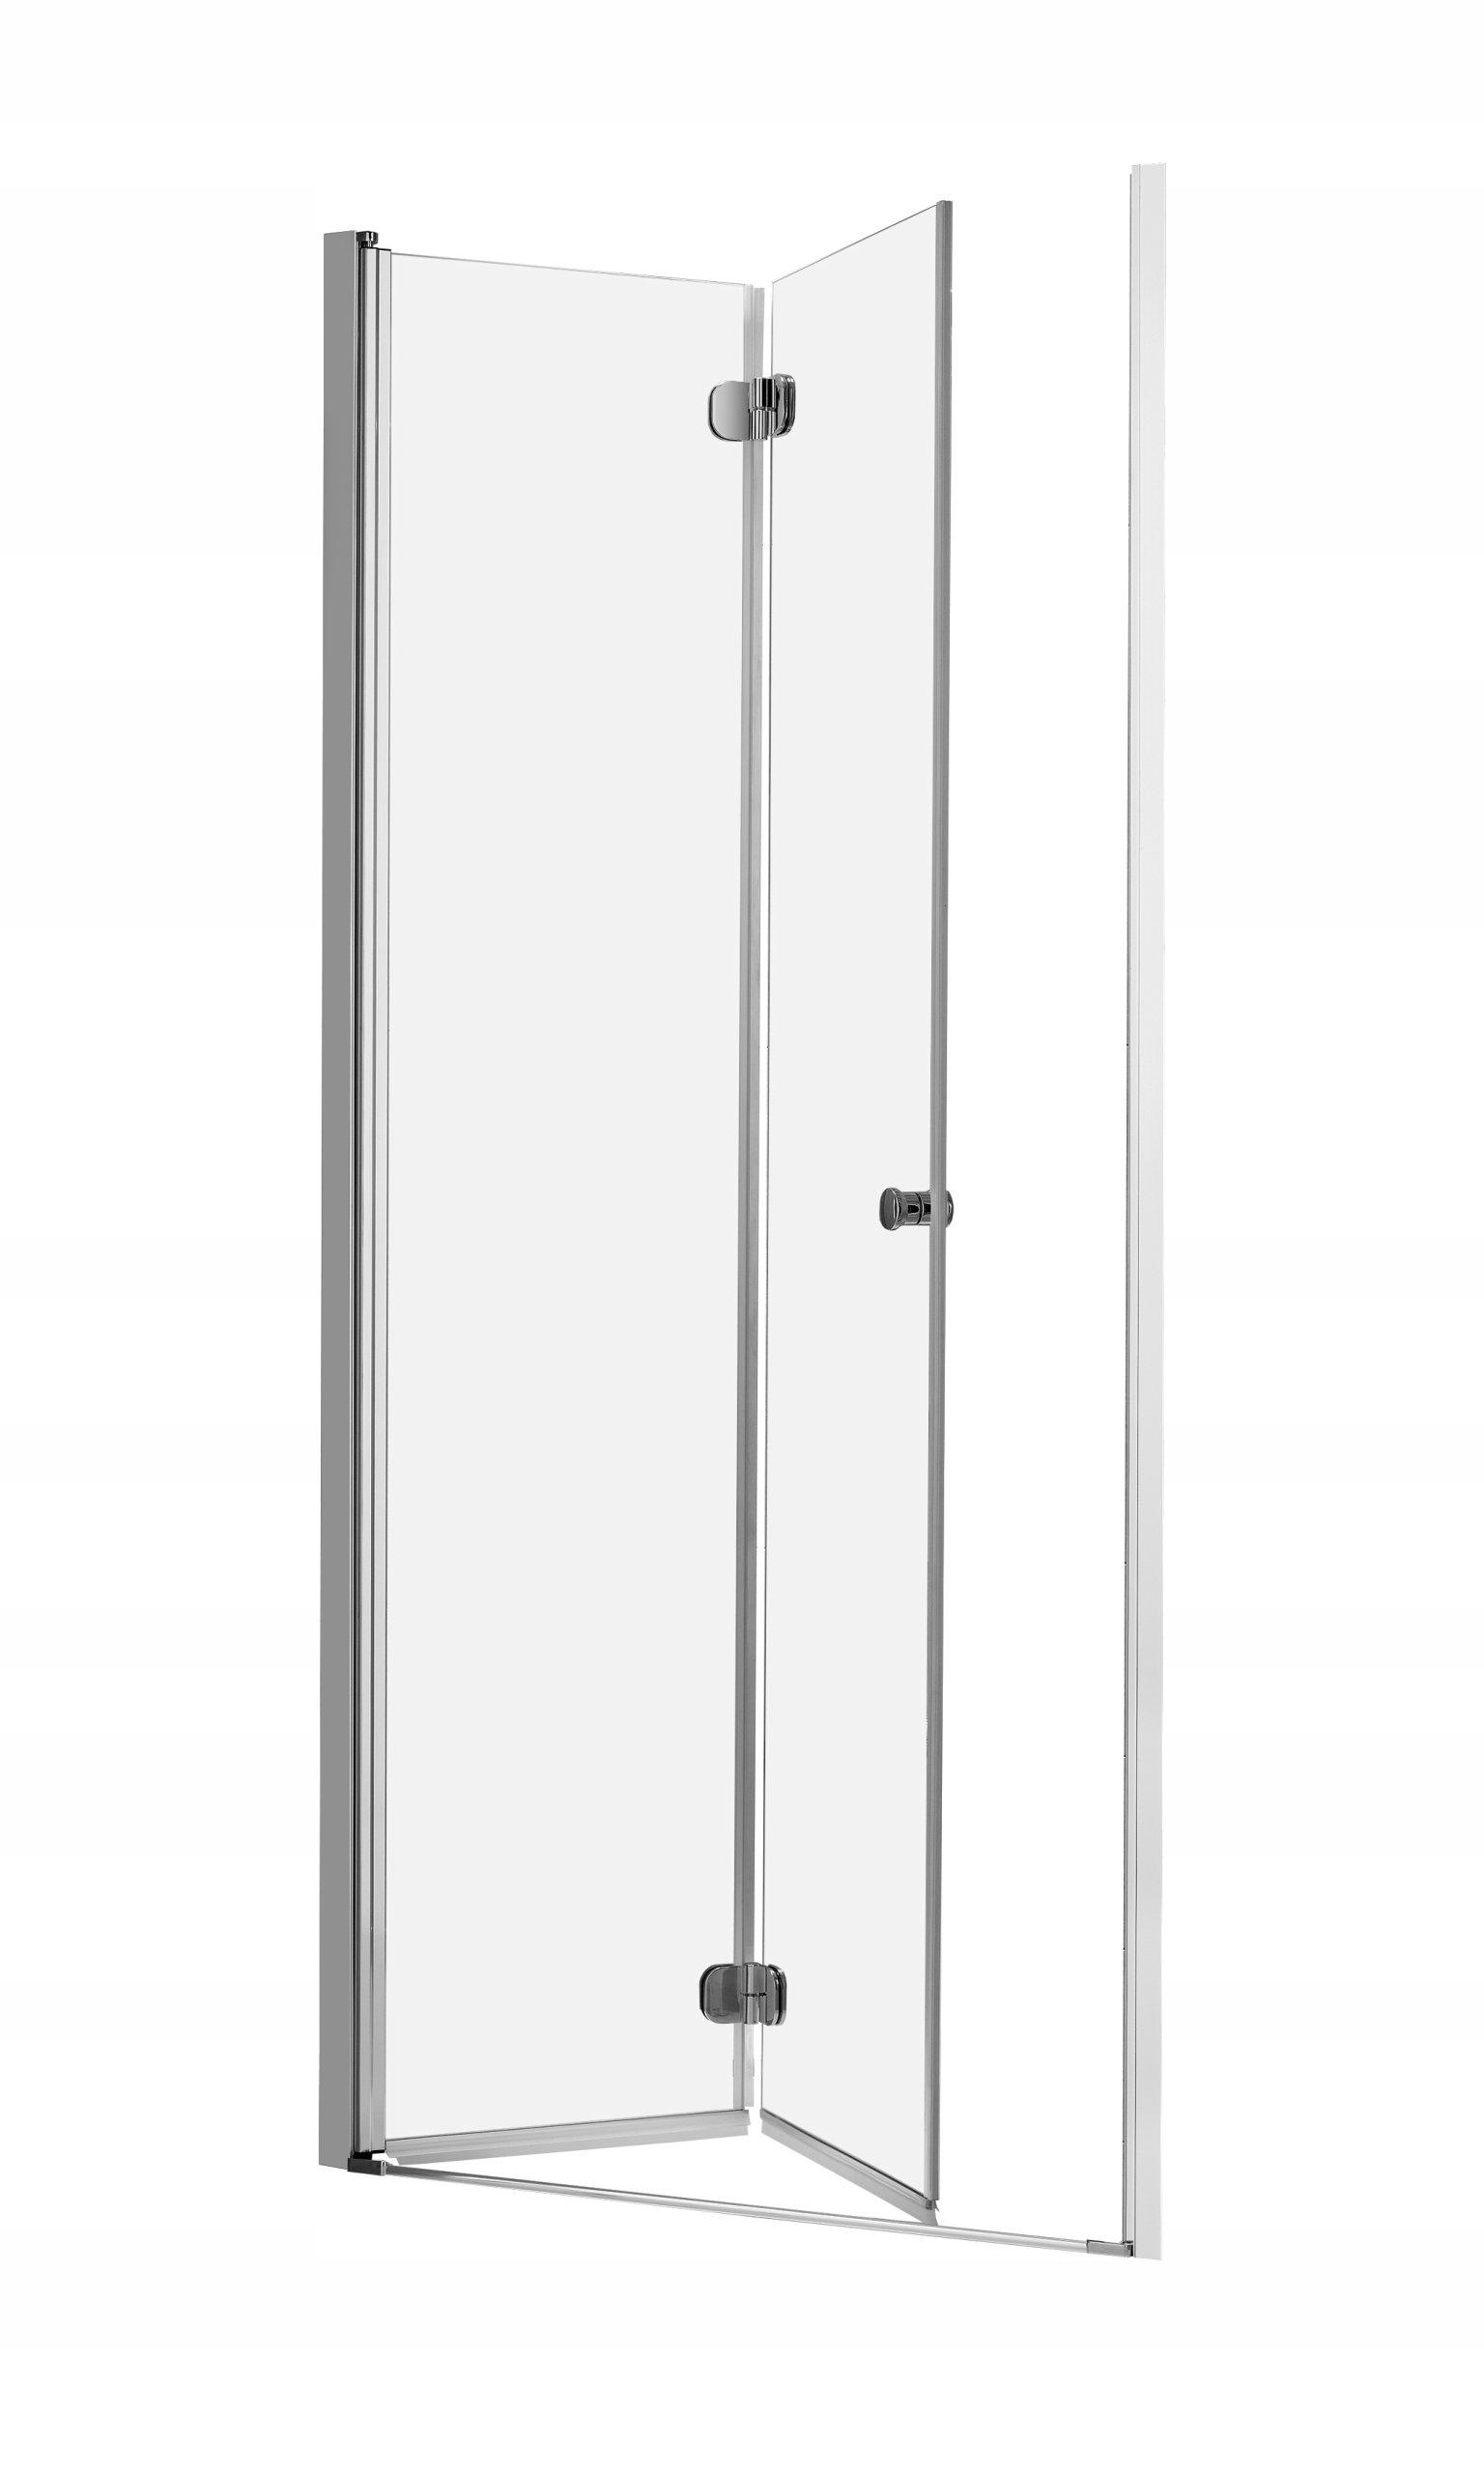 Eos DWB sprchové dvere RADAWAY 70x197 cm